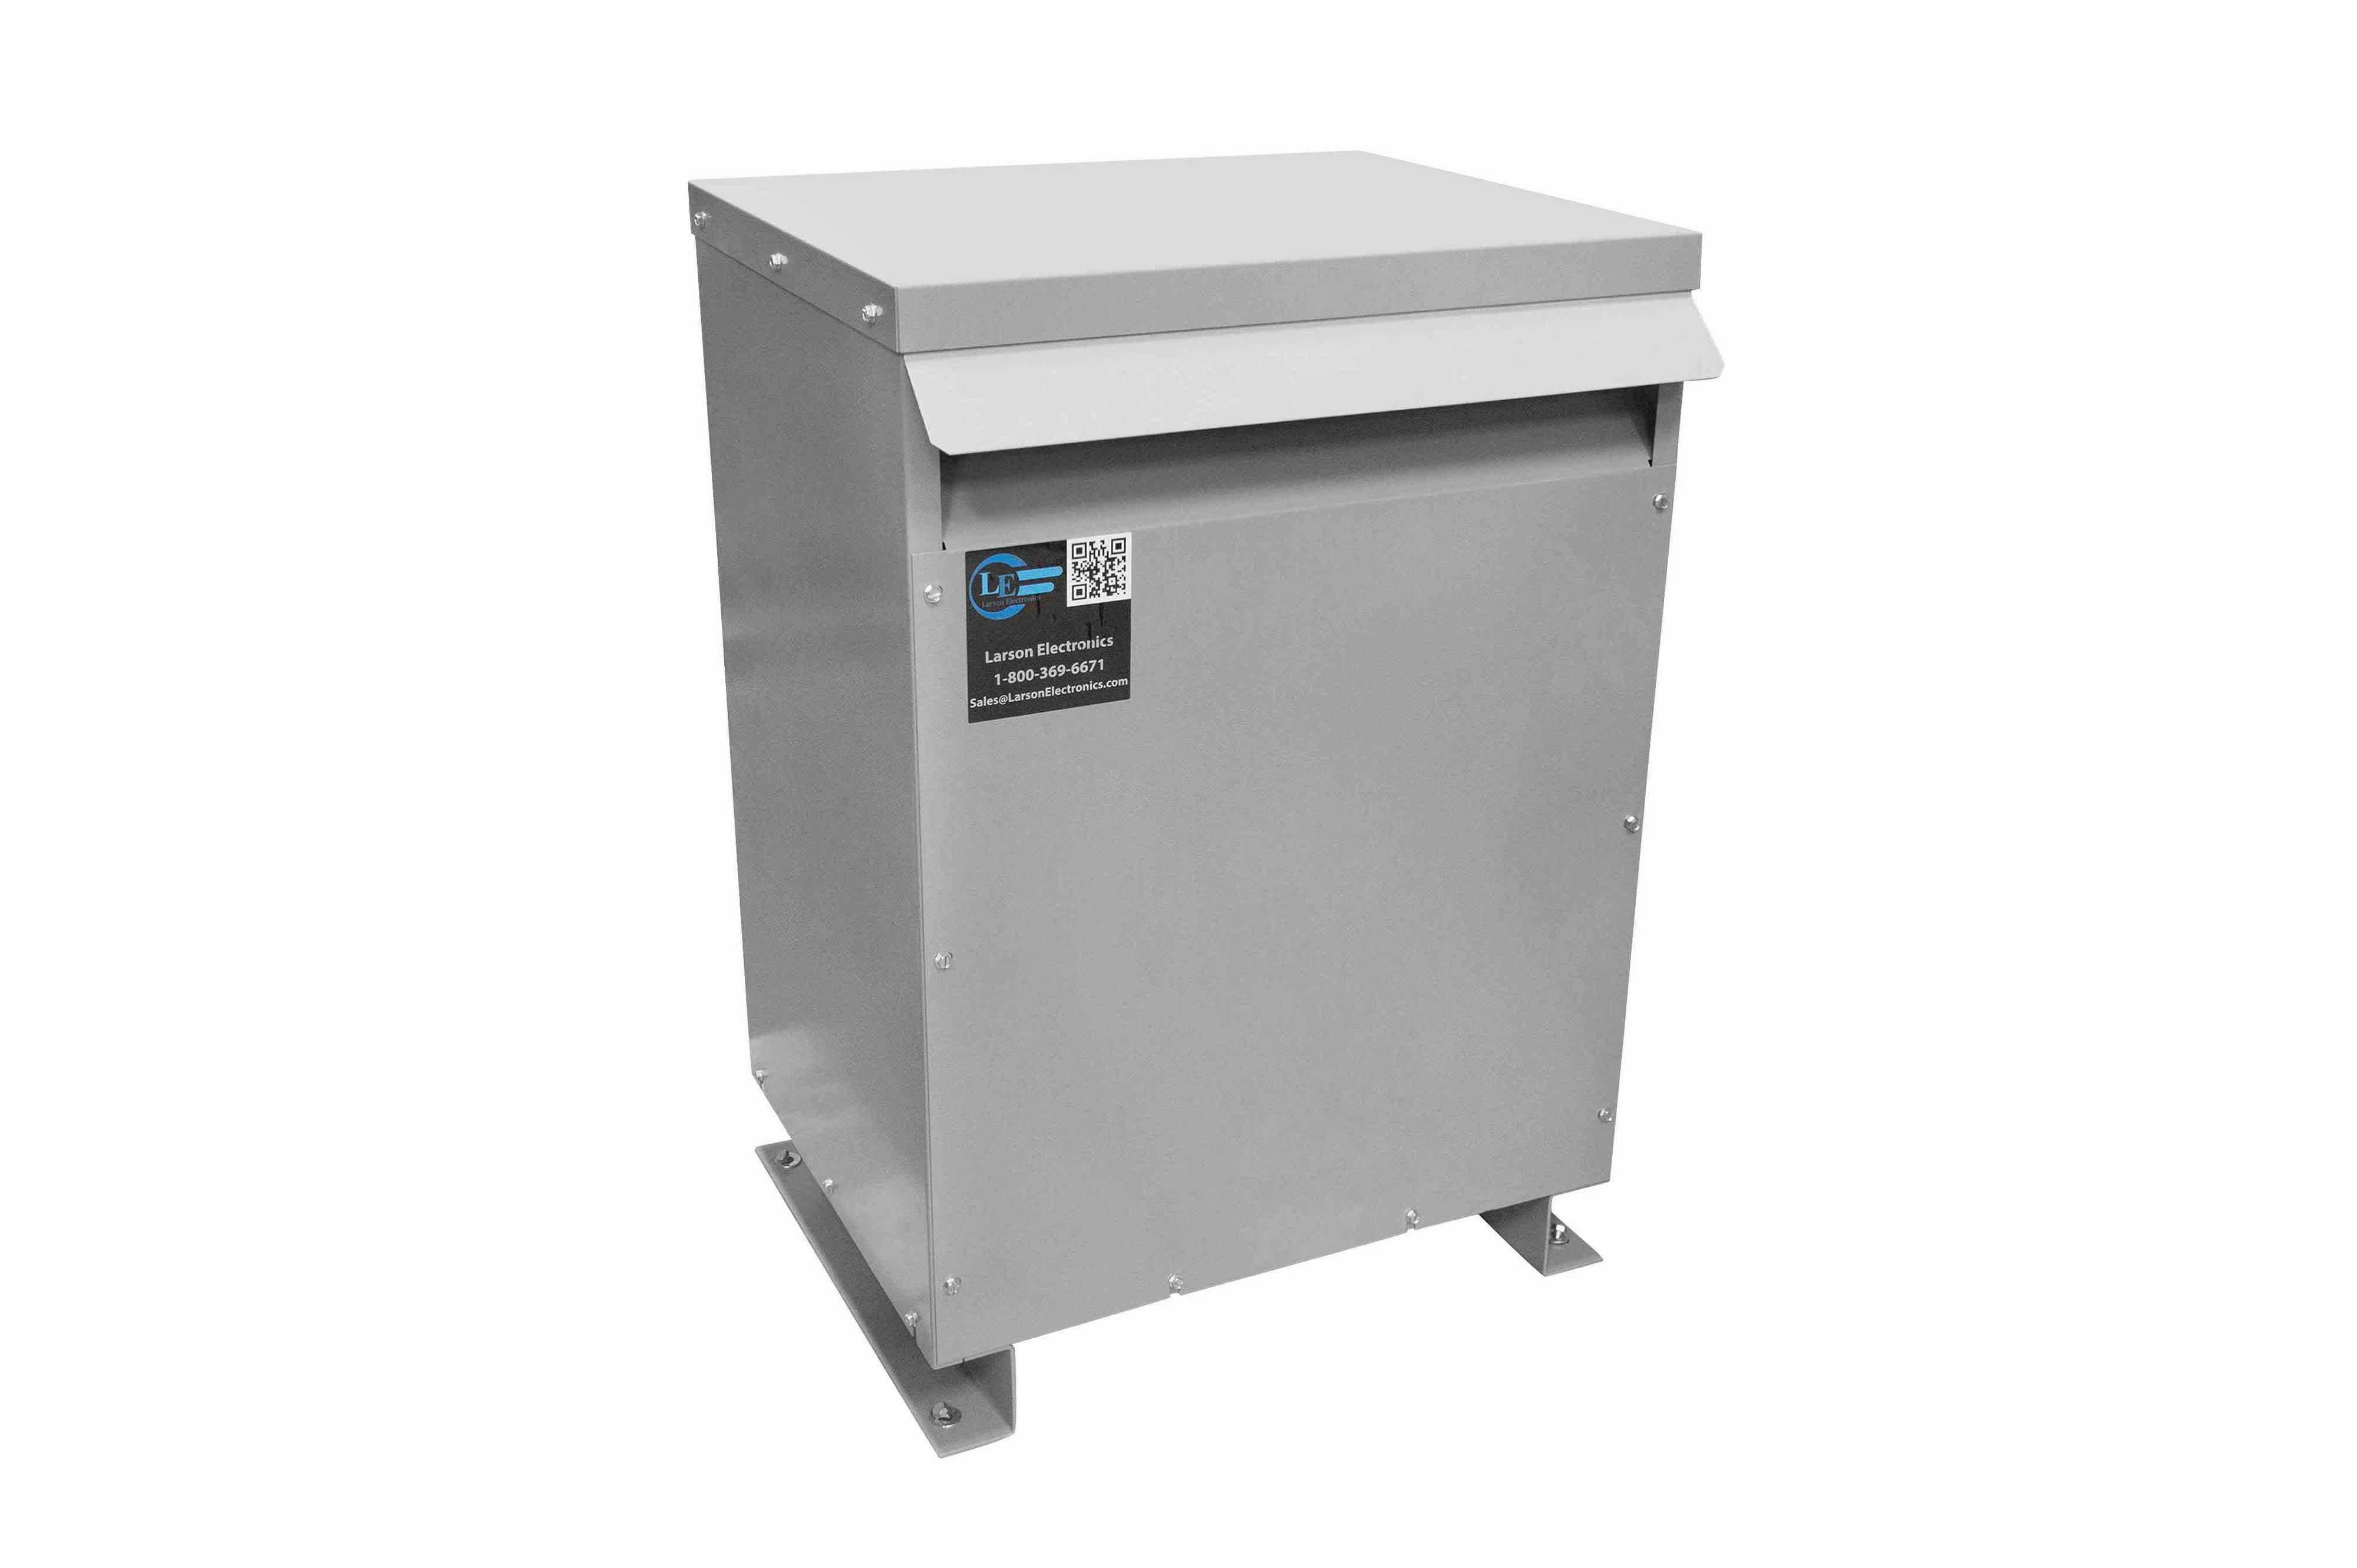 27 kVA 3PH Isolation Transformer, 575V Wye Primary, 480V Delta Secondary, N3R, Ventilated, 60 Hz